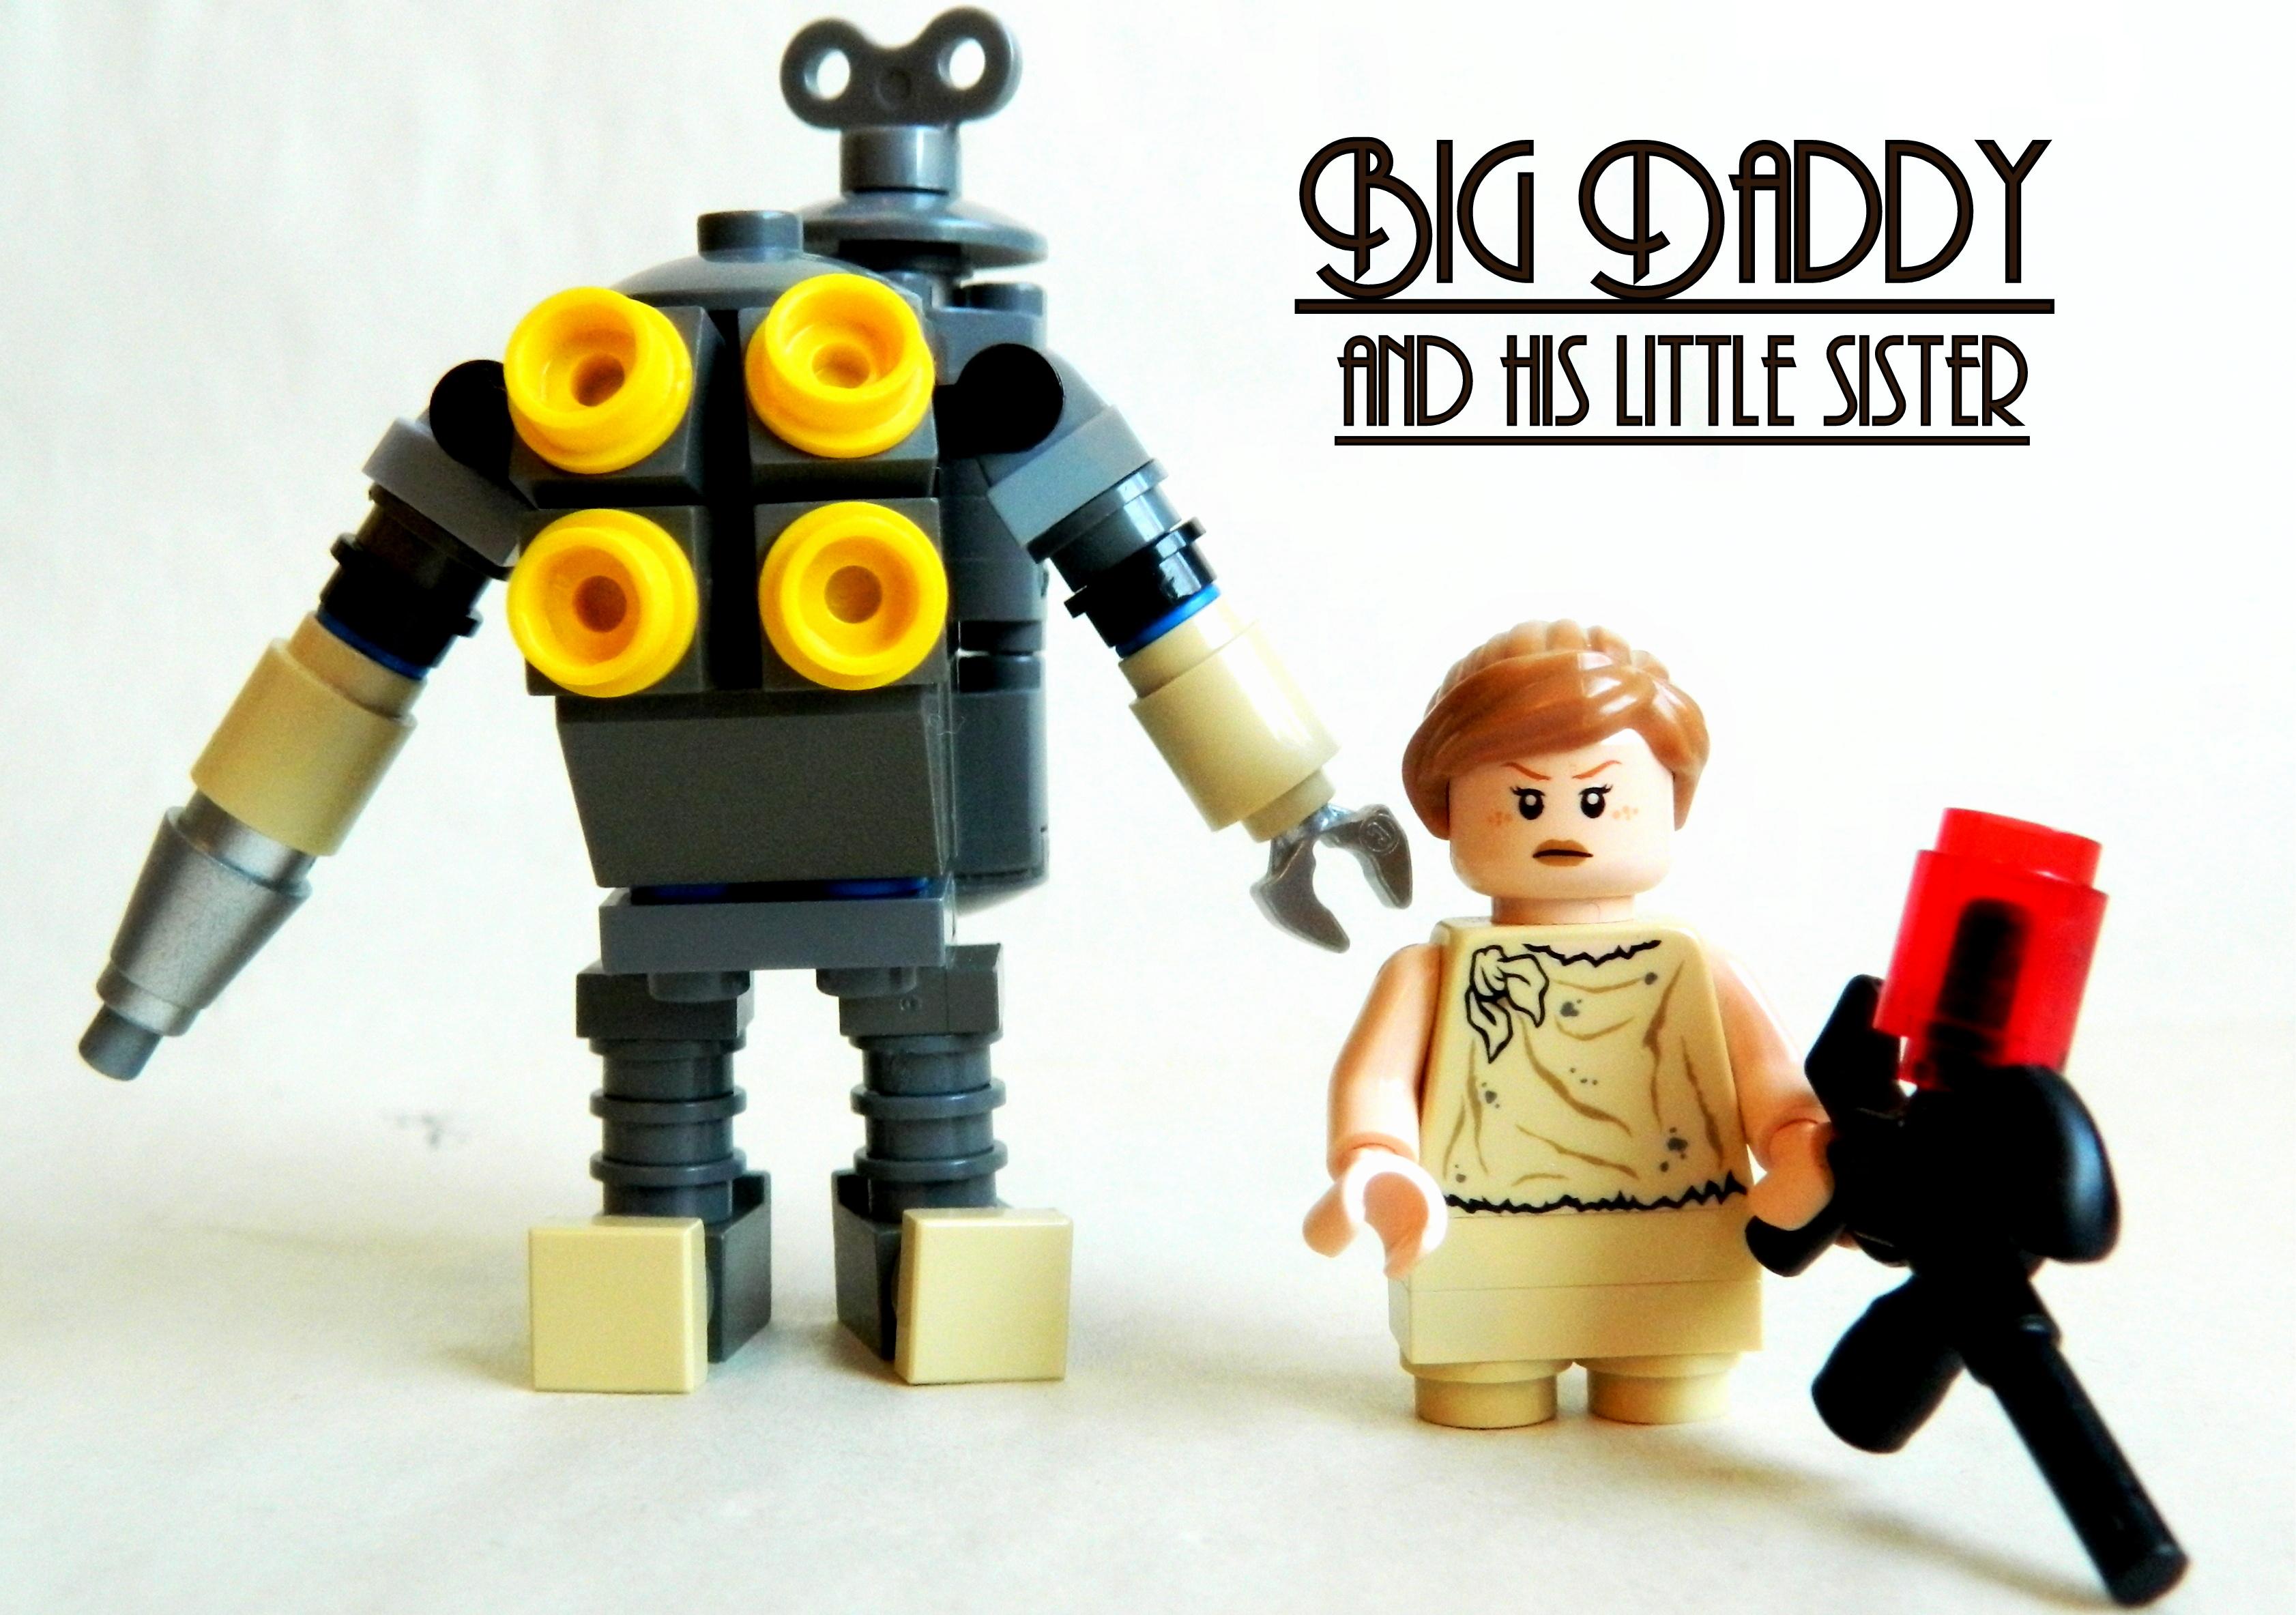 Wallpaper Horror Robot Lego Steampunk Technology Bioshock